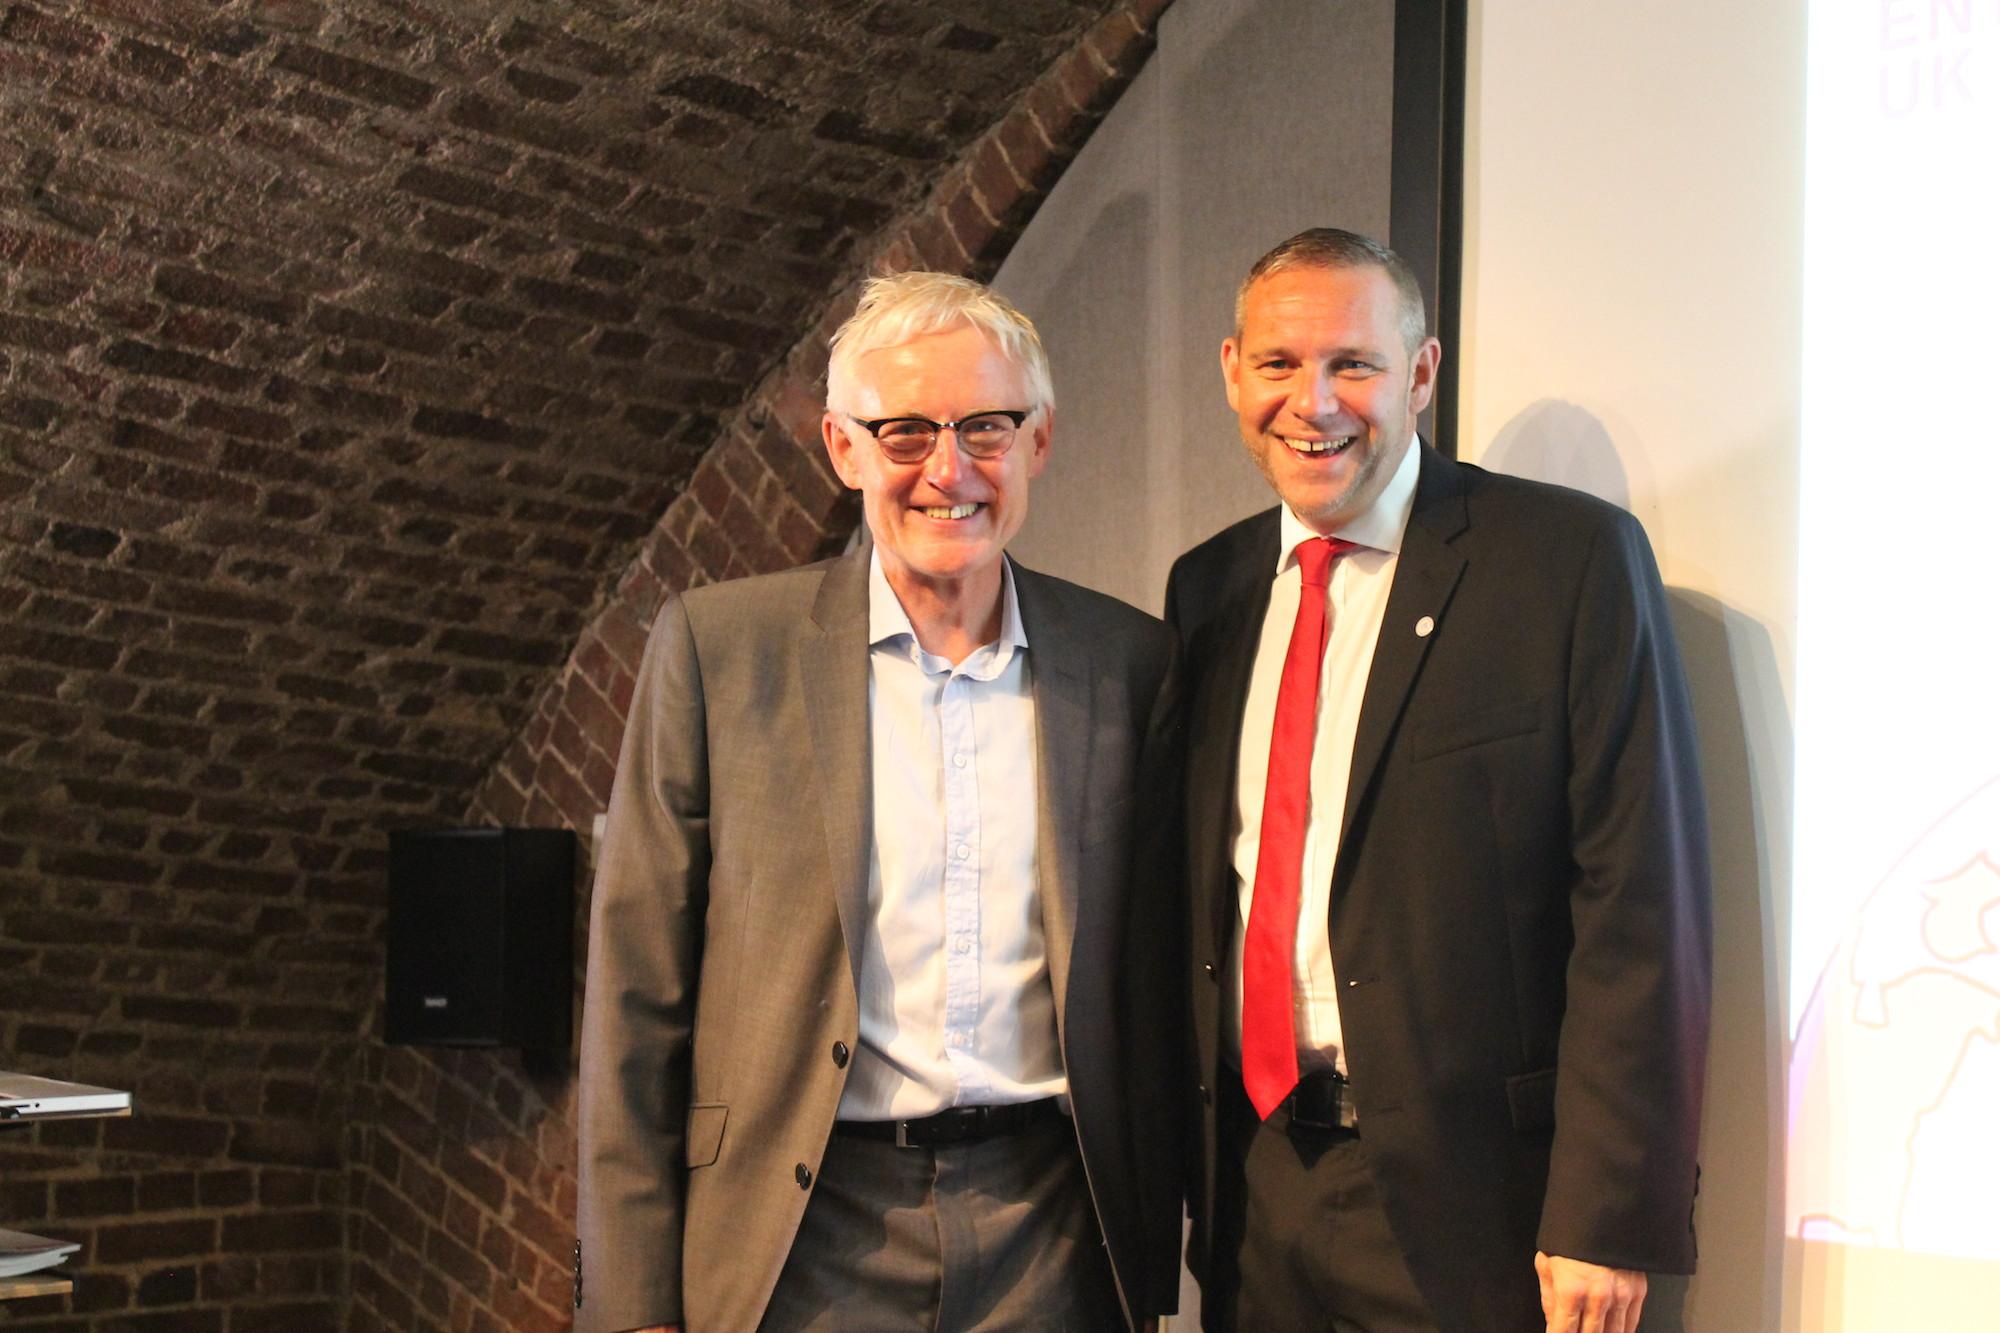 Norman Lamb MP and Peter Holbrook CBE